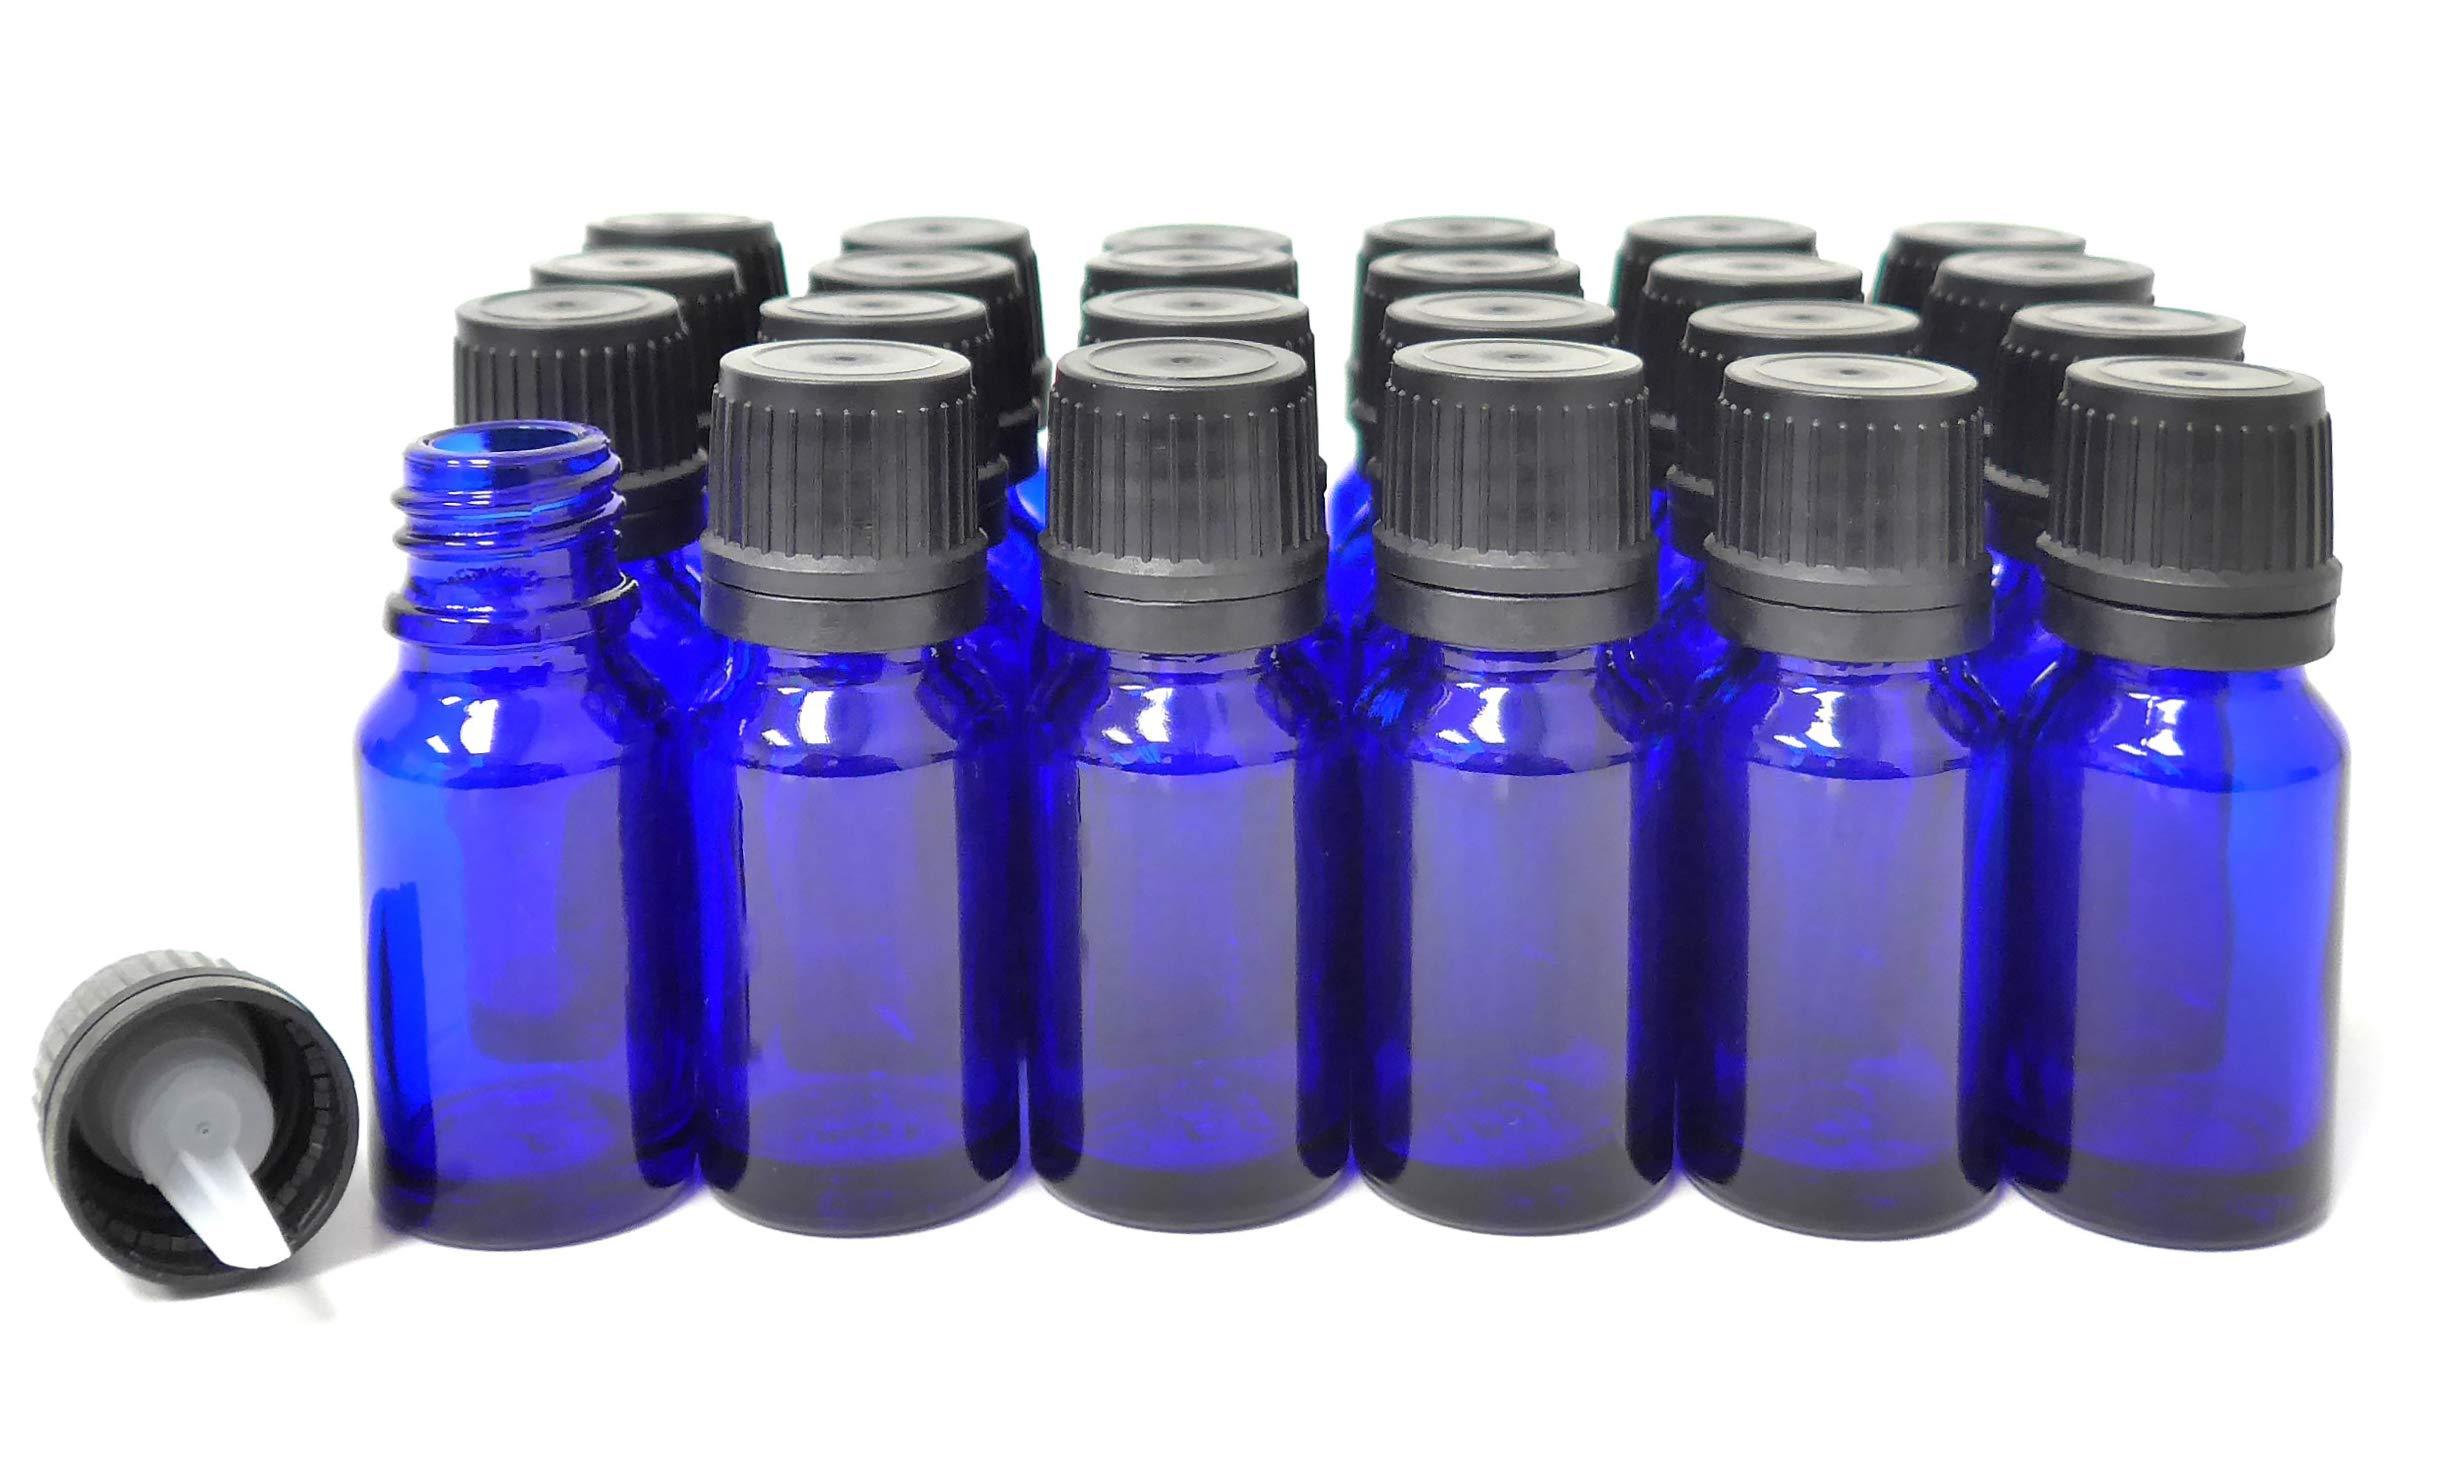 ljdeals 10ml Cobalt Blue Essential Oil Bottle with Euro Dropper Black Cap Glass Bottles Pack of 24